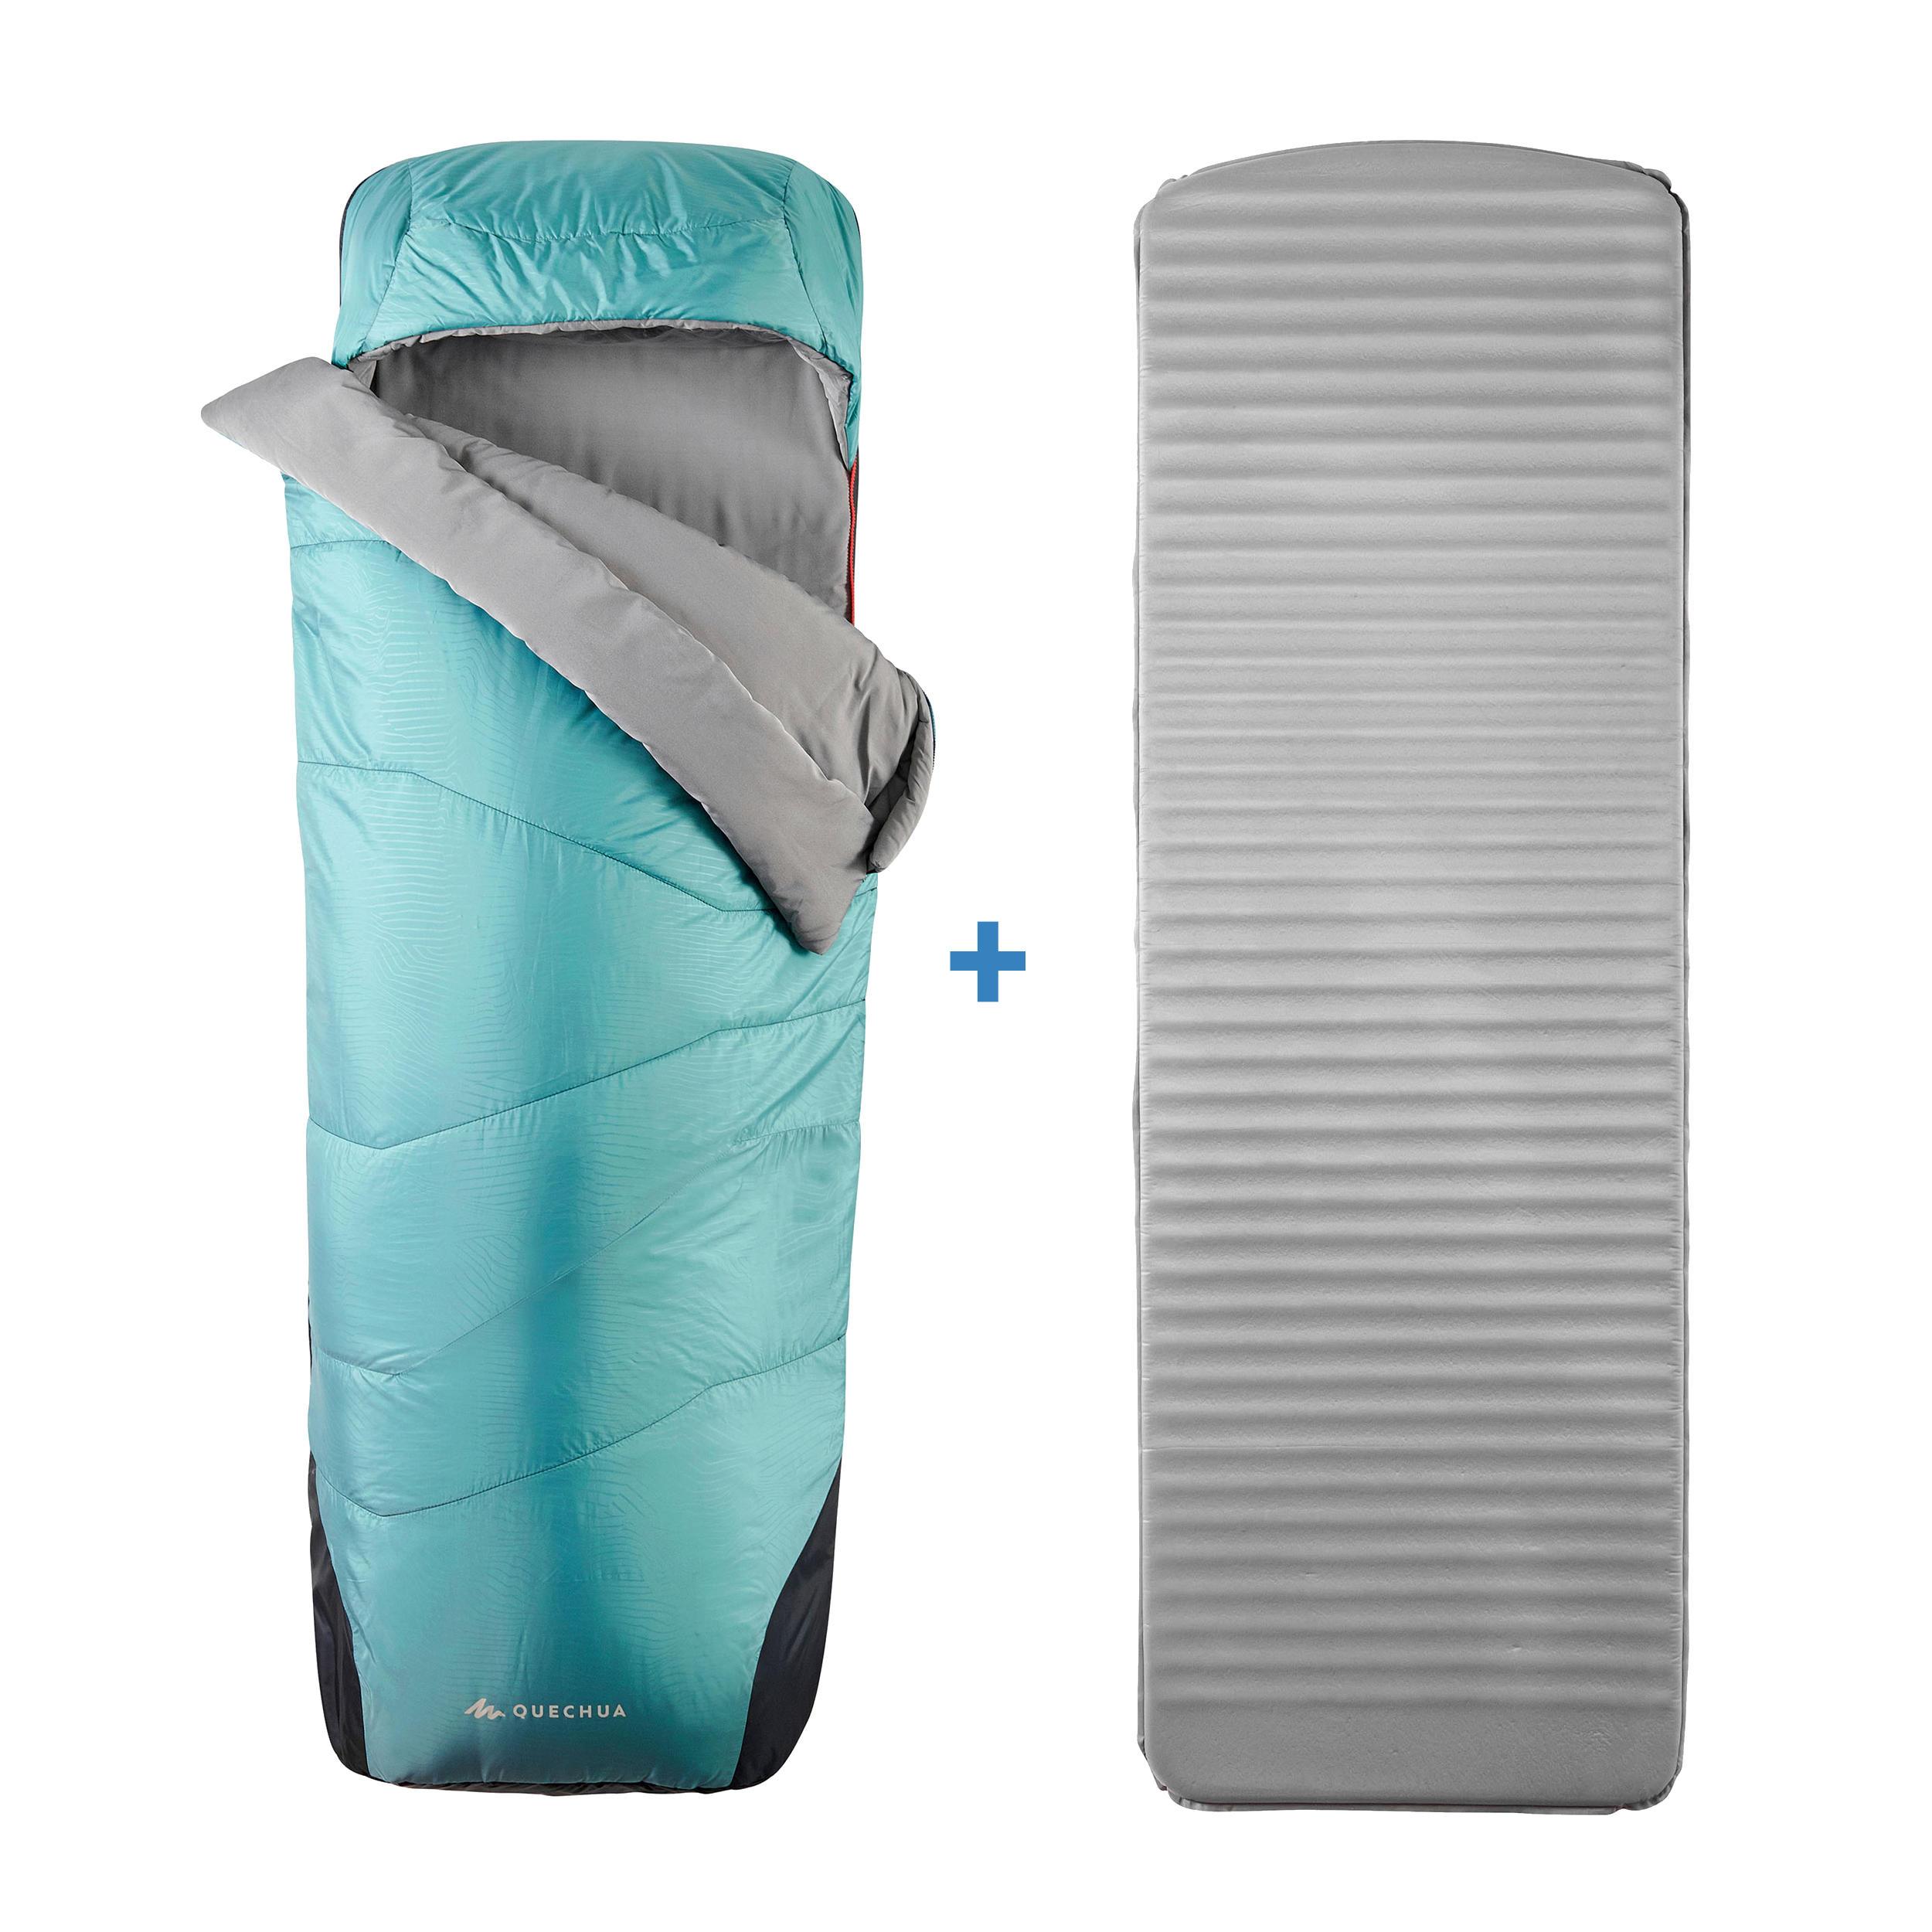 quechua sacco a pelo 2 in 1 campeggio sleepin'bed mh500 5°c xl azzurro